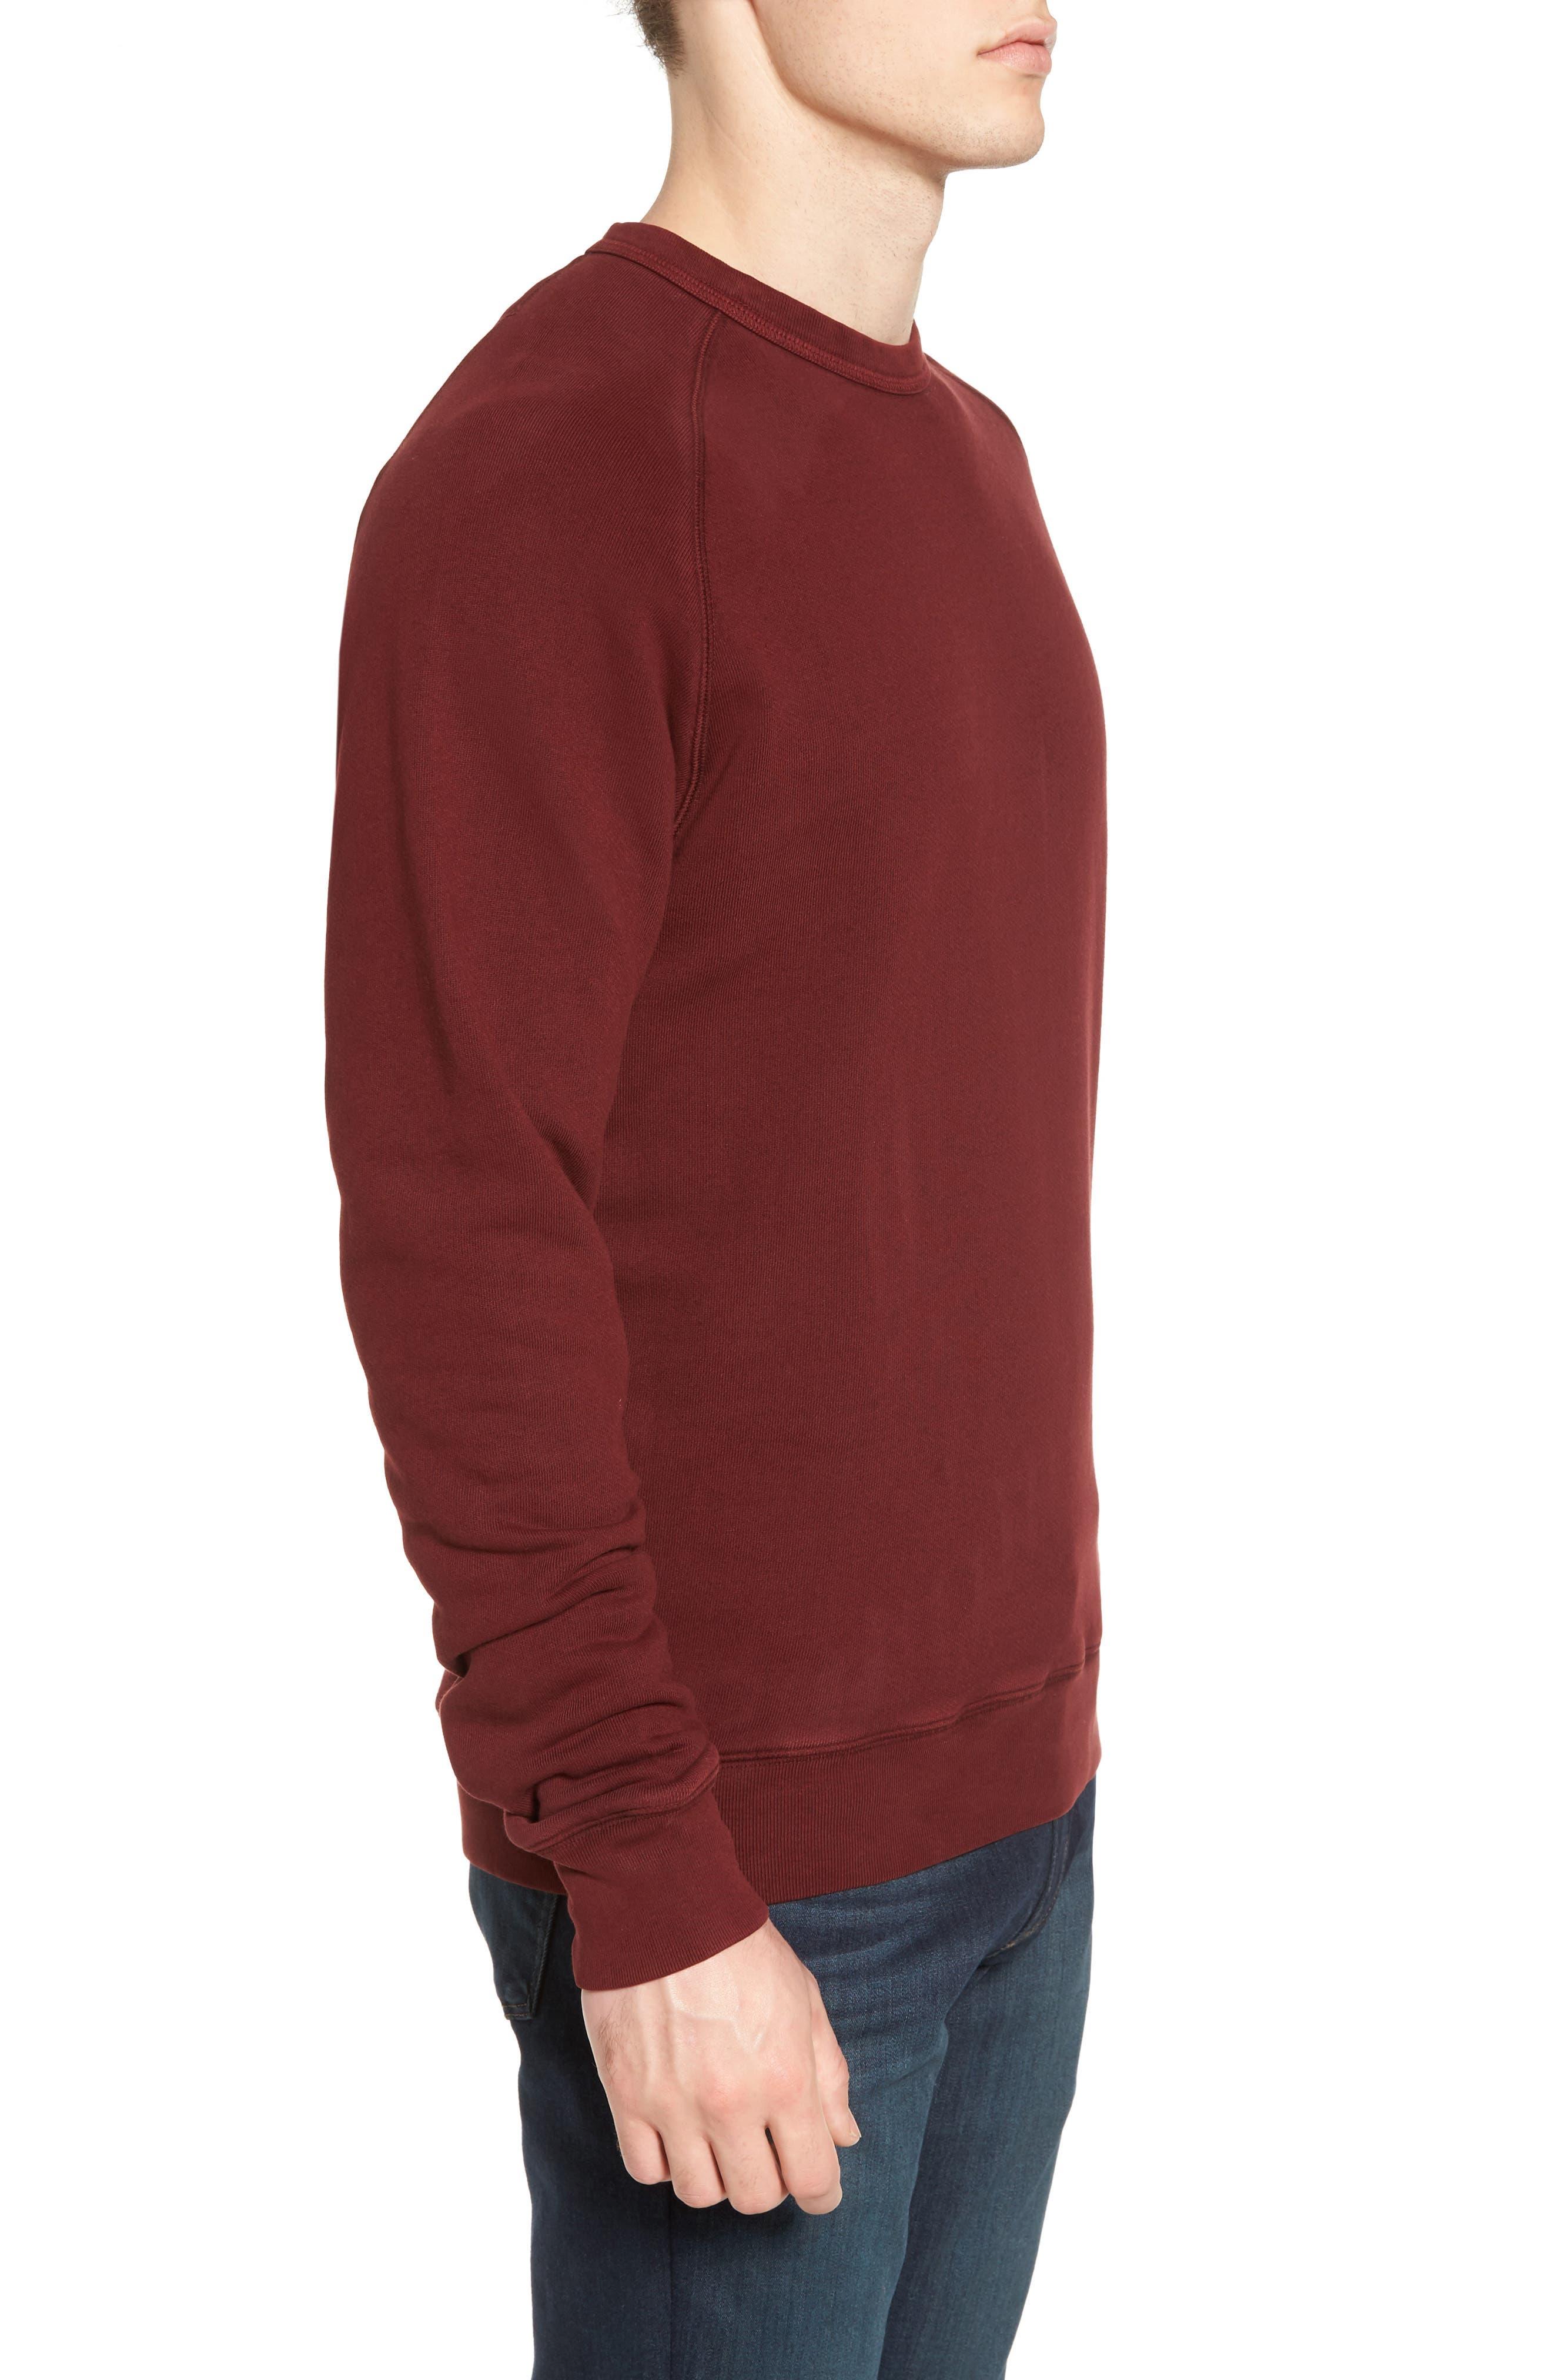 South Sea Raglan Sweatshirt,                             Alternate thumbnail 9, color,